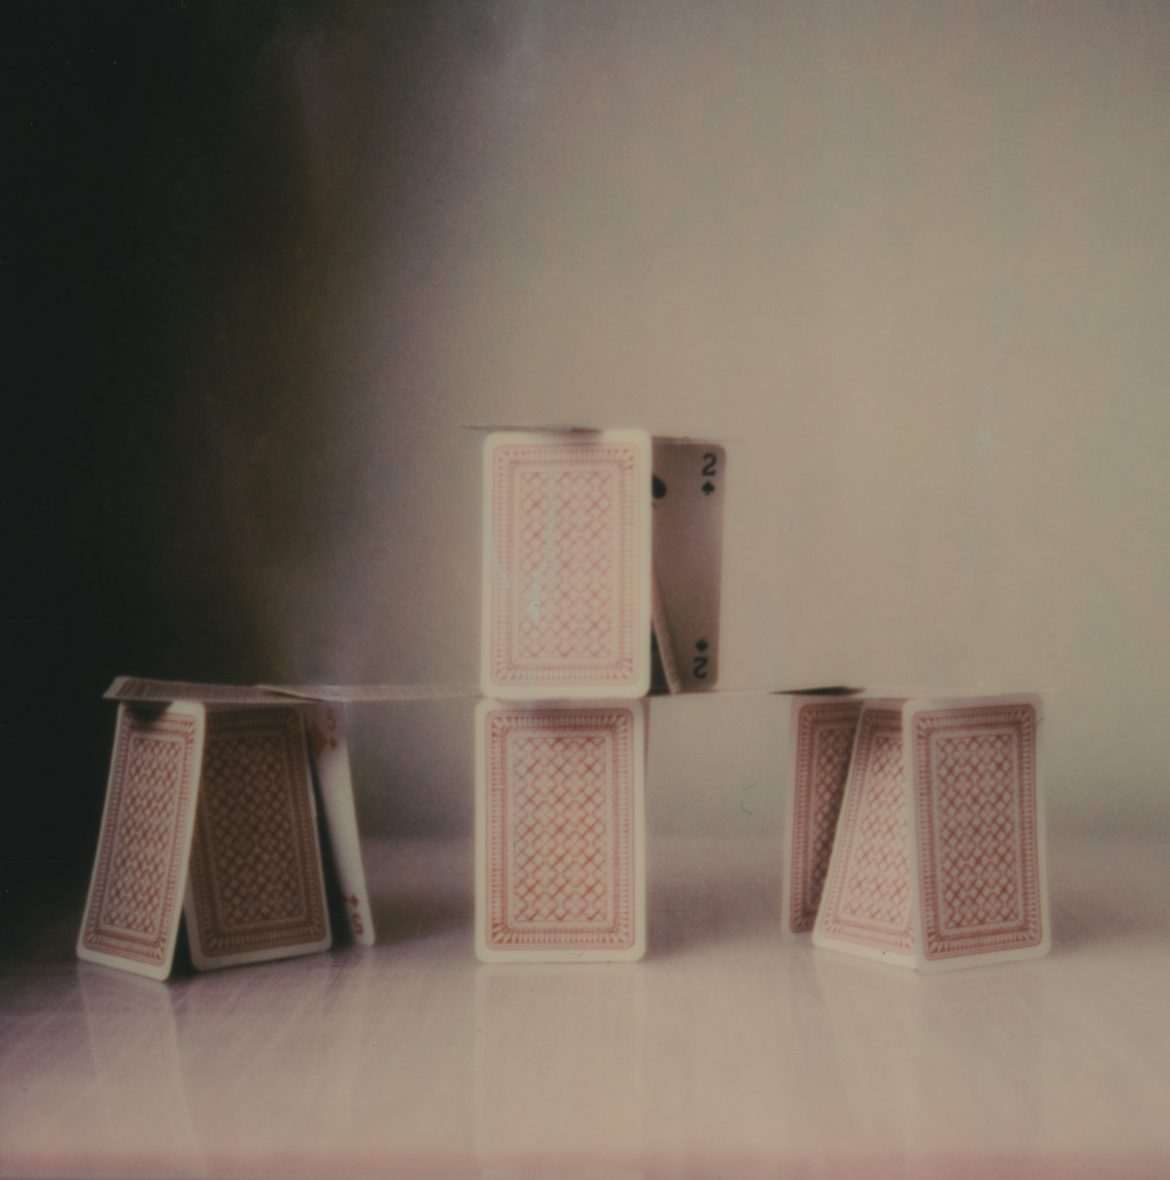 Château de cartes, polaroid, 2019